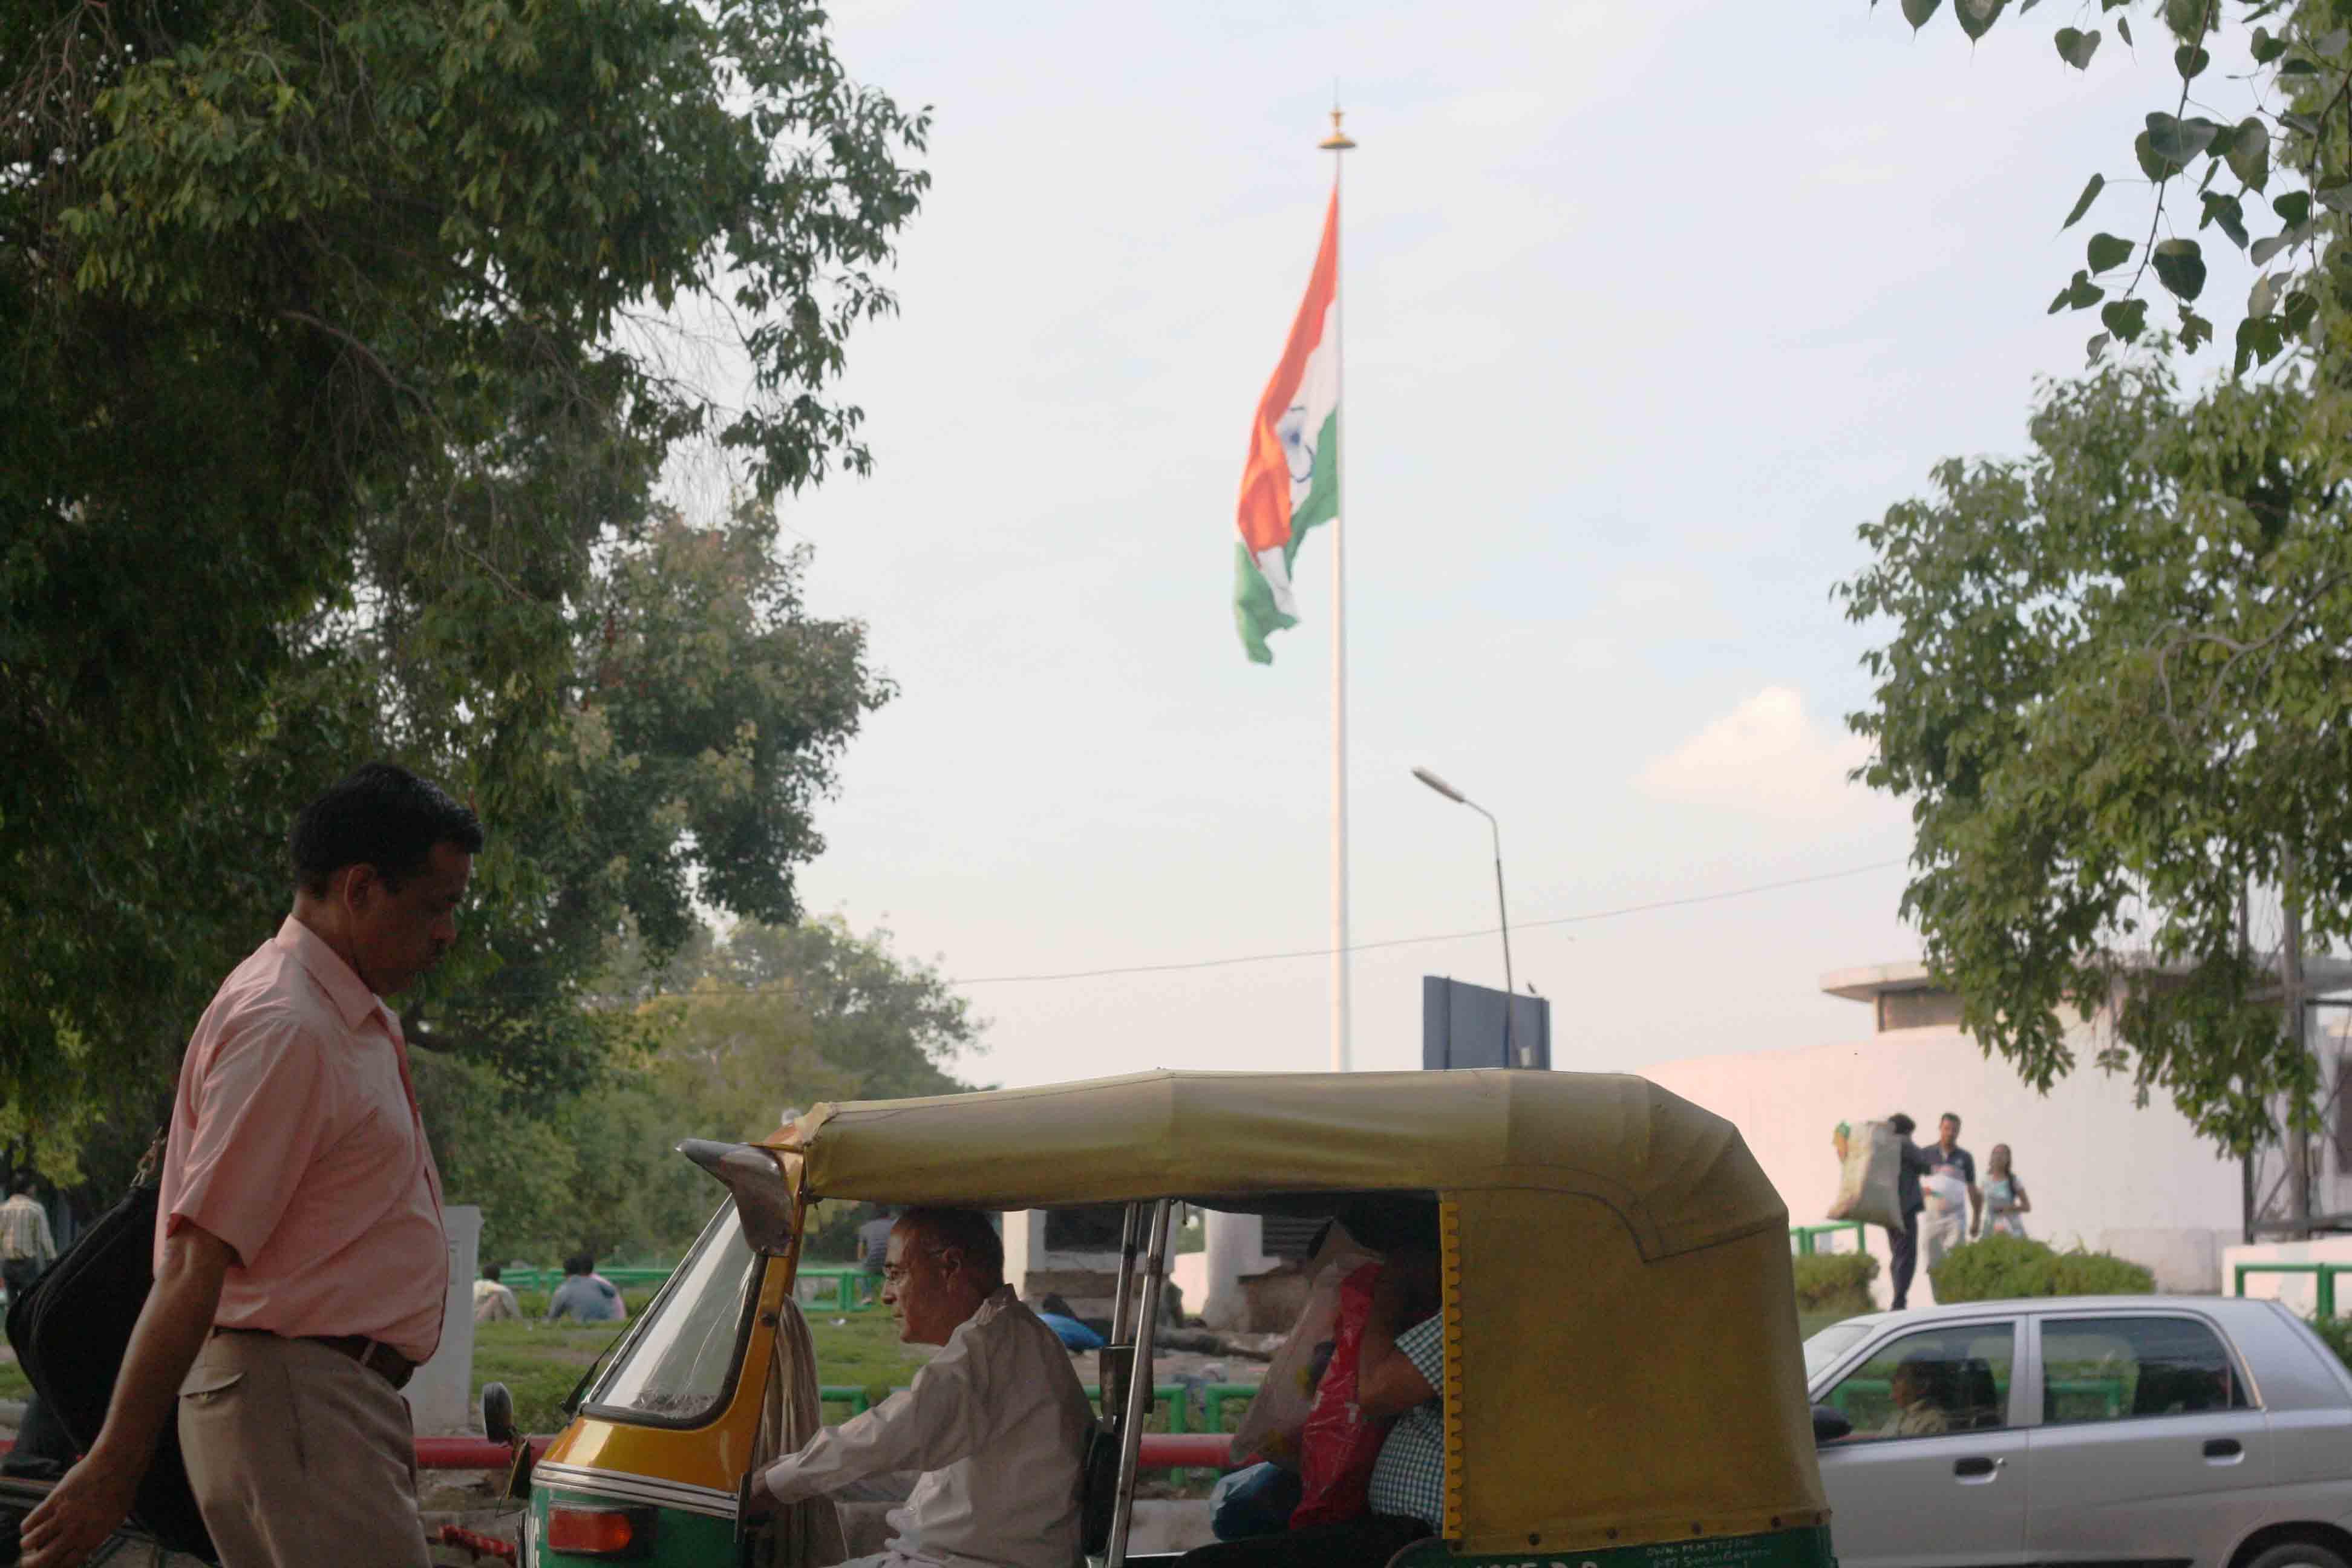 City Landmark - Indian National Flag, Central Park